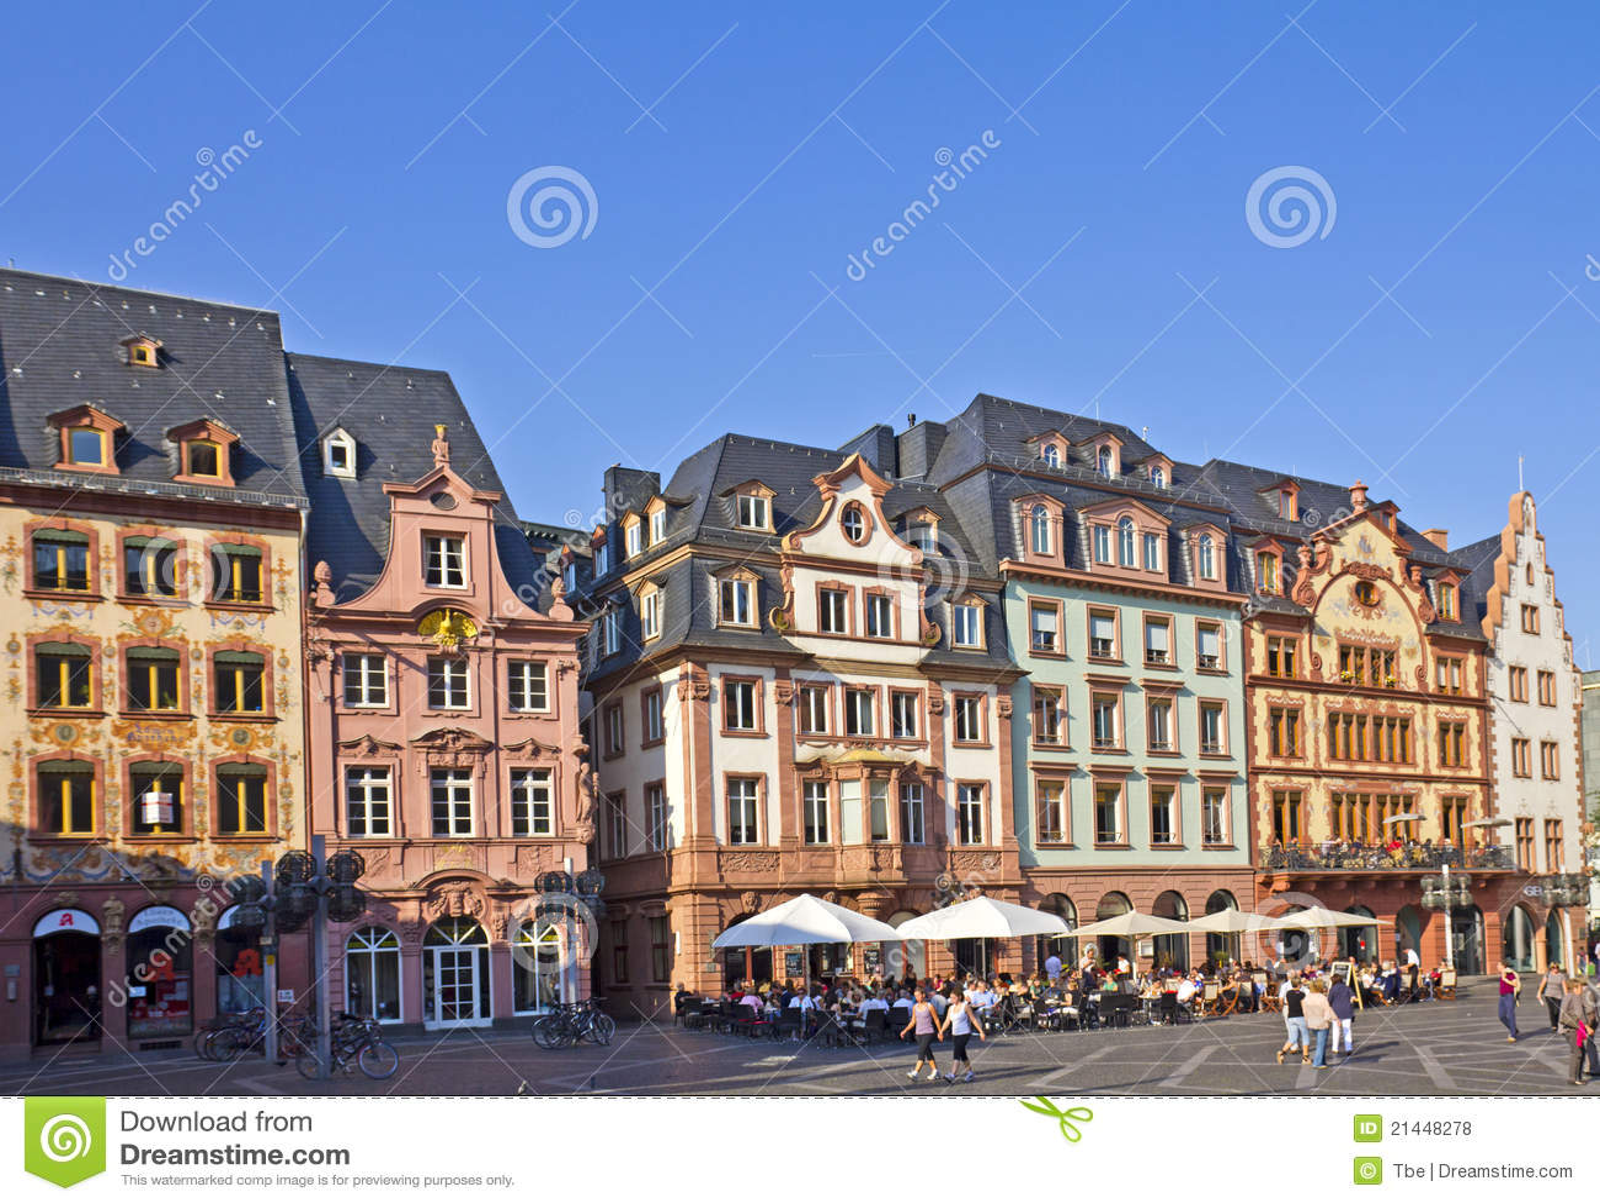 Mainz City Center Editorial Stock Photo Image 21448278